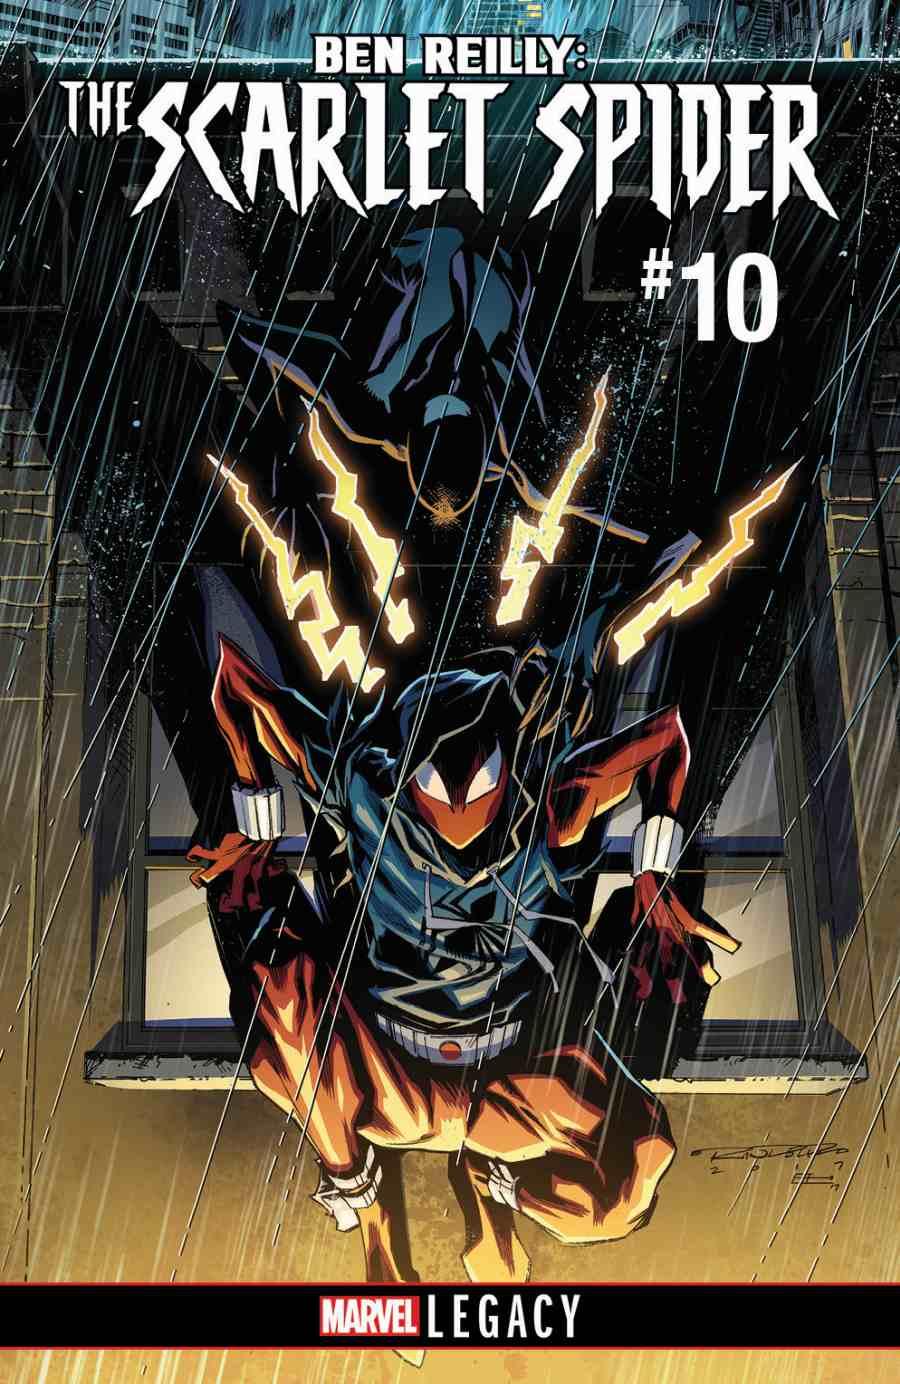 Ben Reilly The Scarlet Spider 10 Marvel Legacy